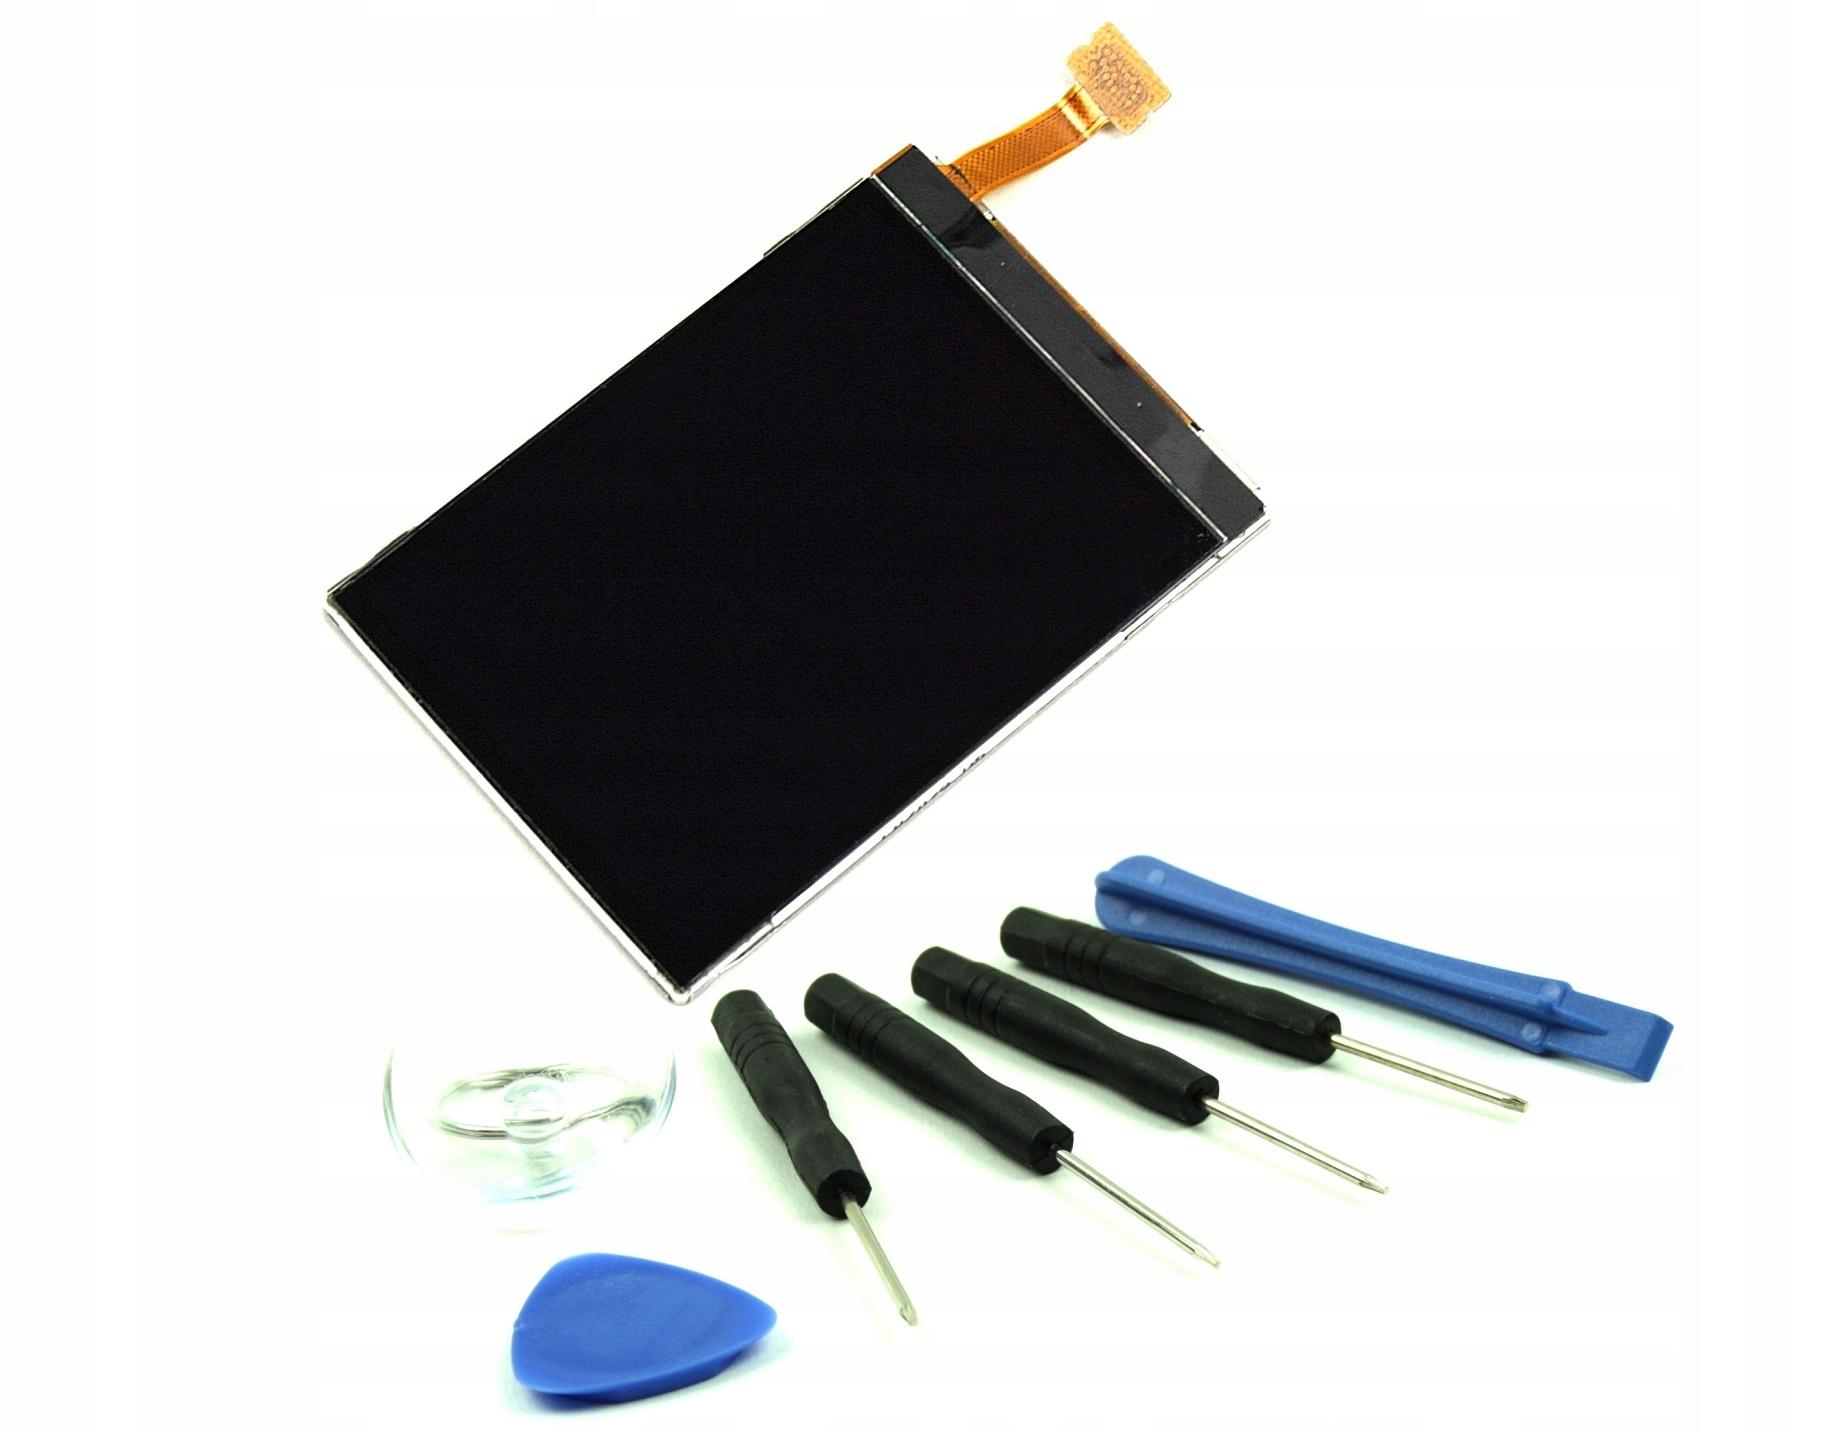 WYSWIETLACZ LCD NOKIA E66 E52 E55 E75 6210N N82